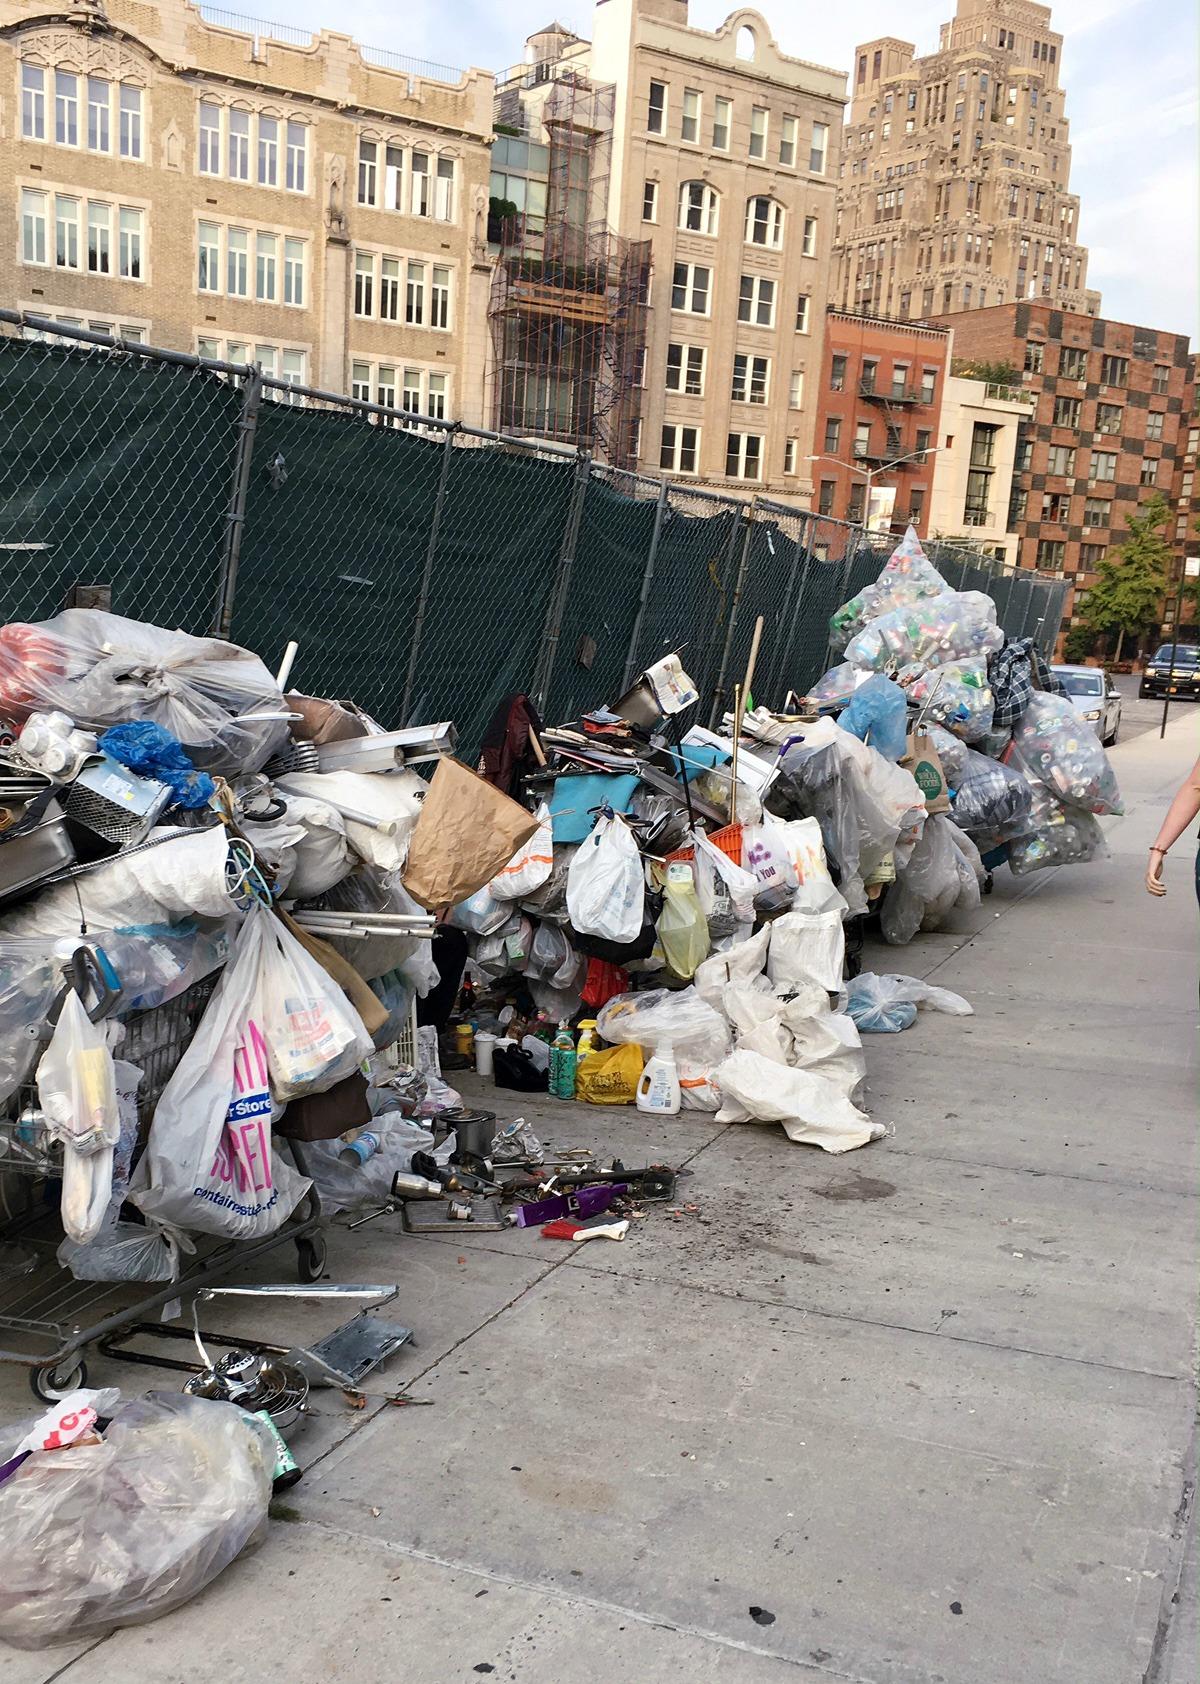 New York Fashion Week Diary : Garbage lining Glastonbury